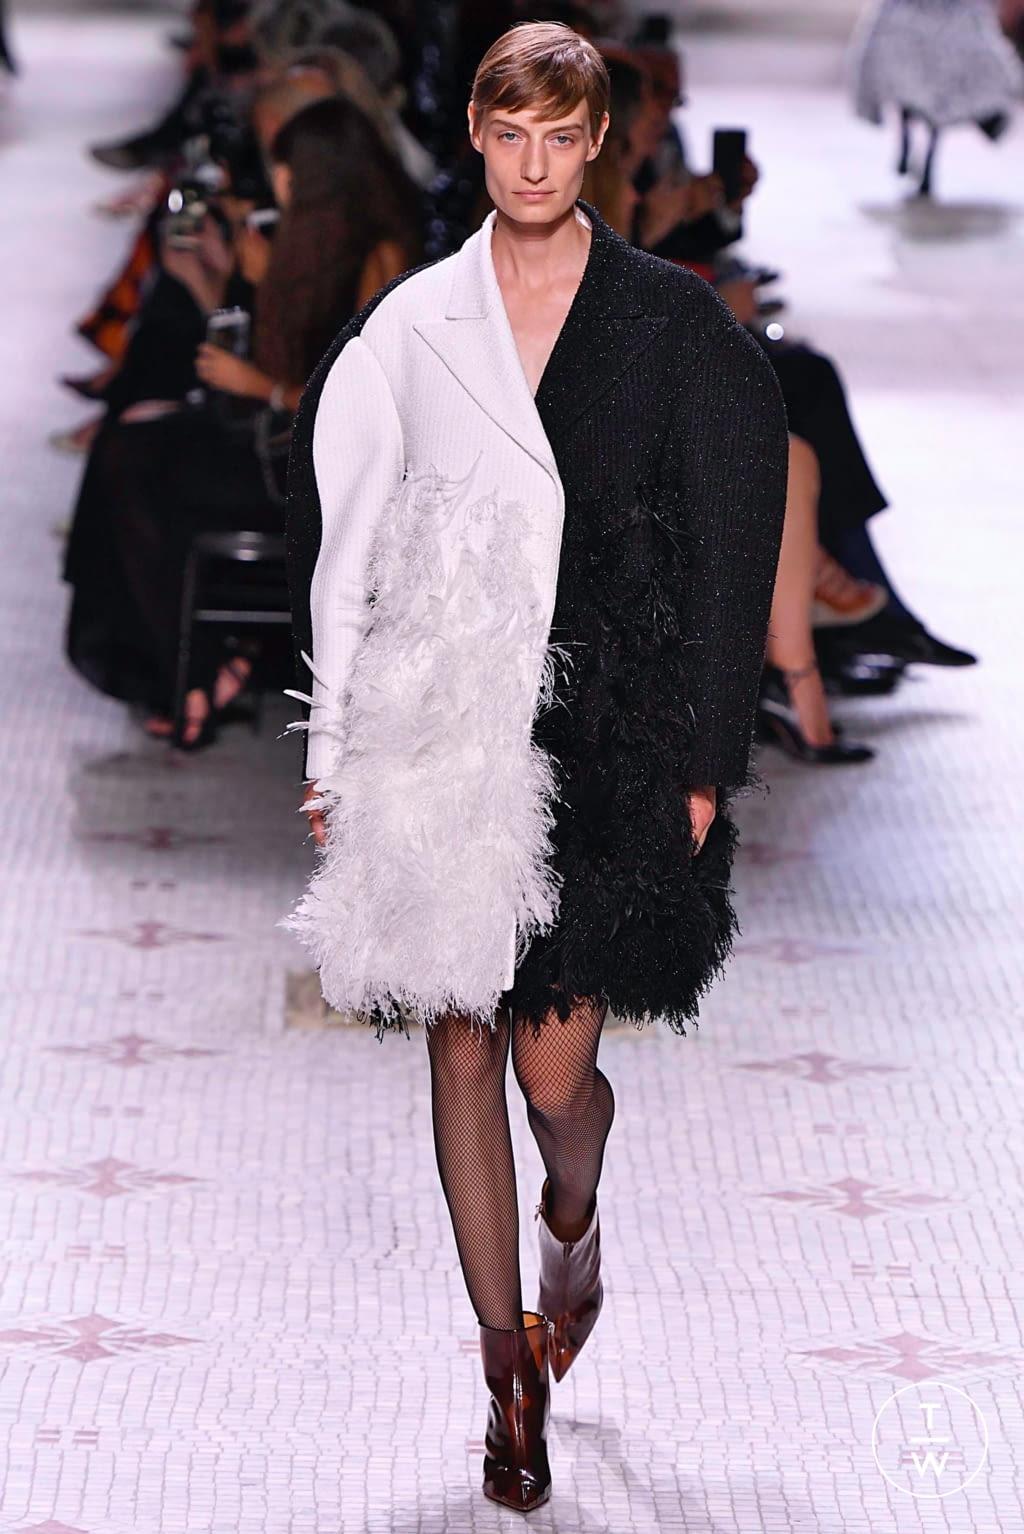 Fashion Week Paris Fall/Winter 2019 look 4 de la collection Givenchy couture